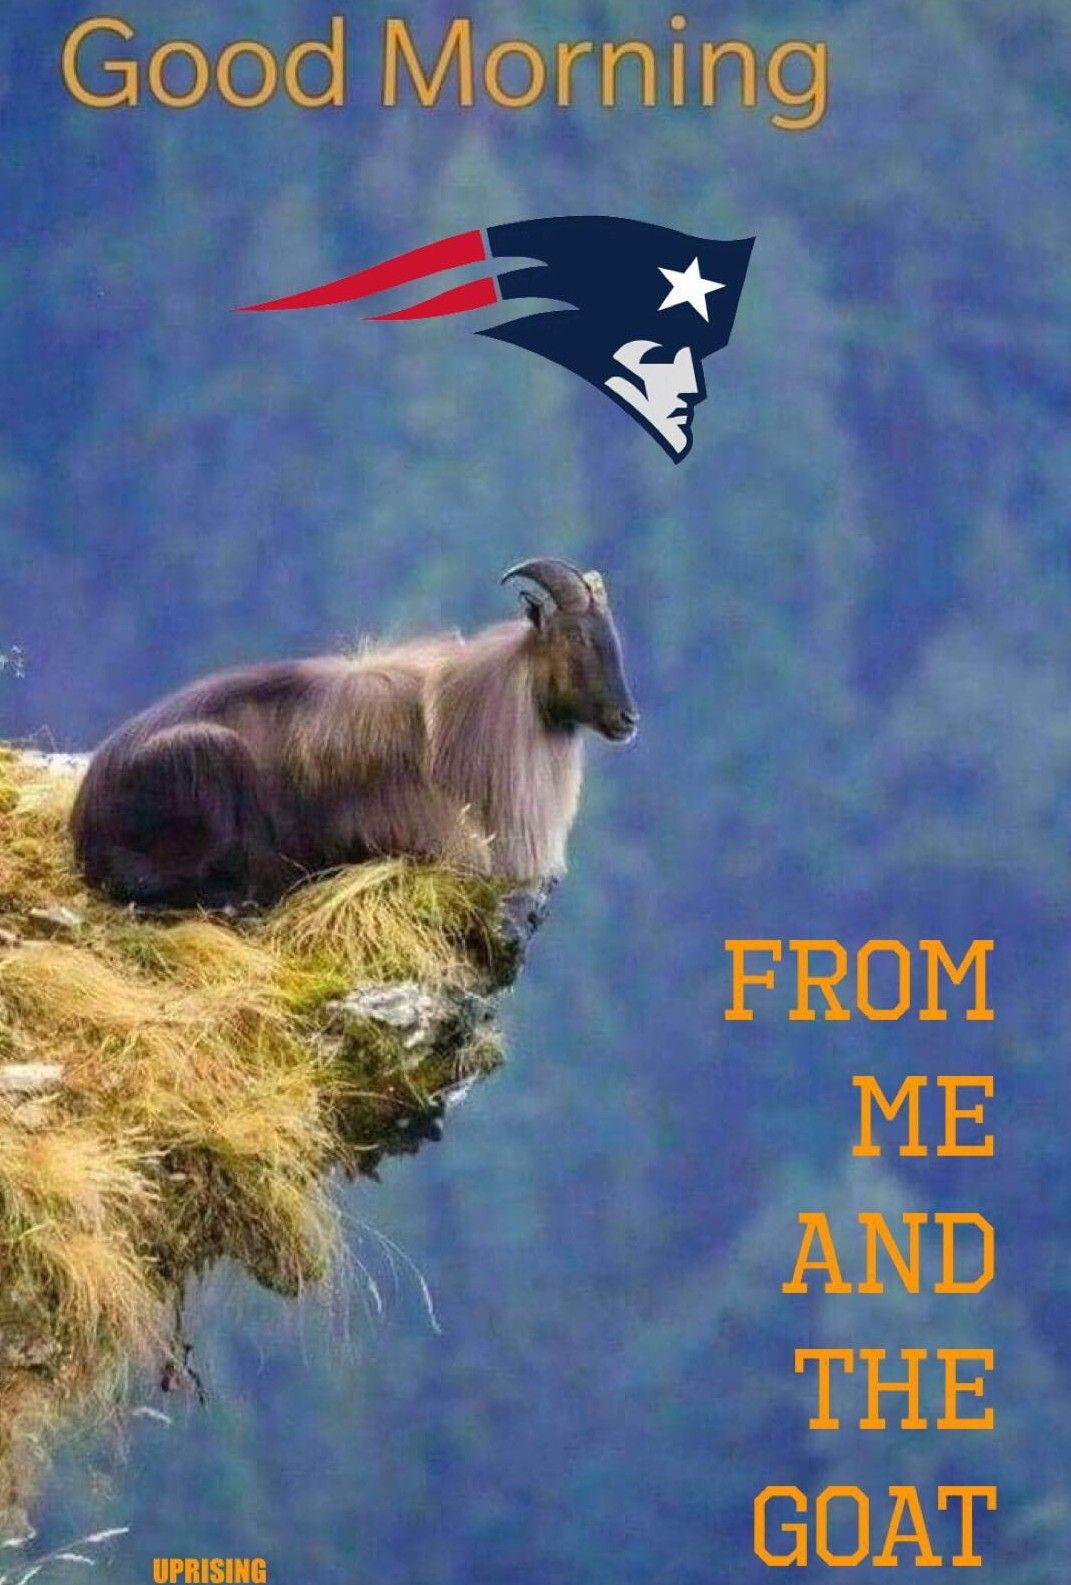 Pin By Paula Lopes On Patriots Patriots Memes New England Patriots Patriots Football